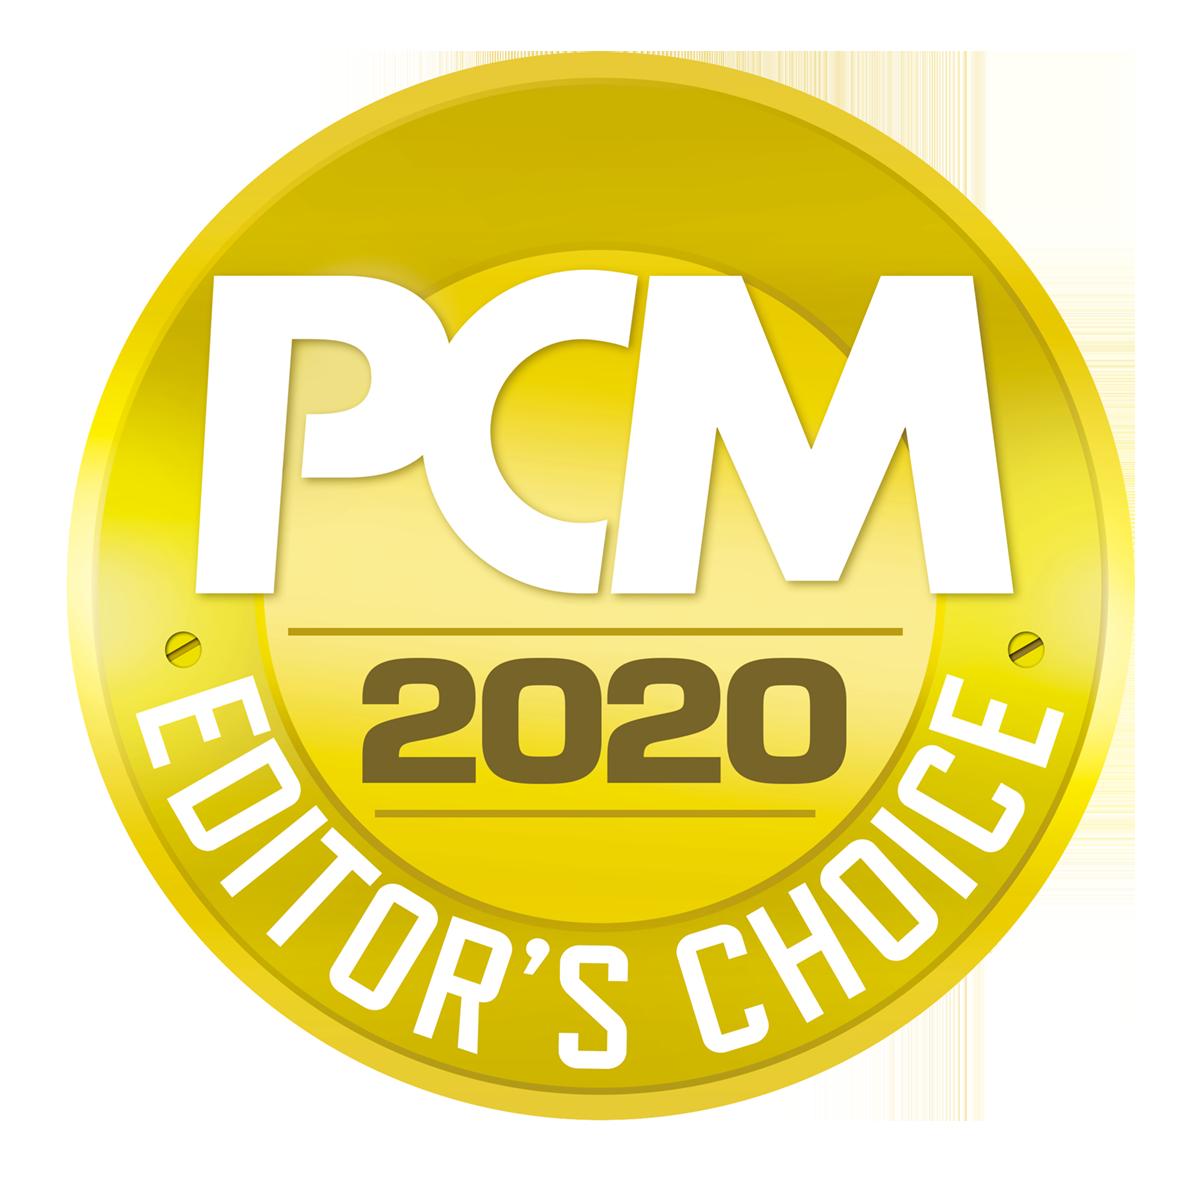 PCM Editor's Choice 2020